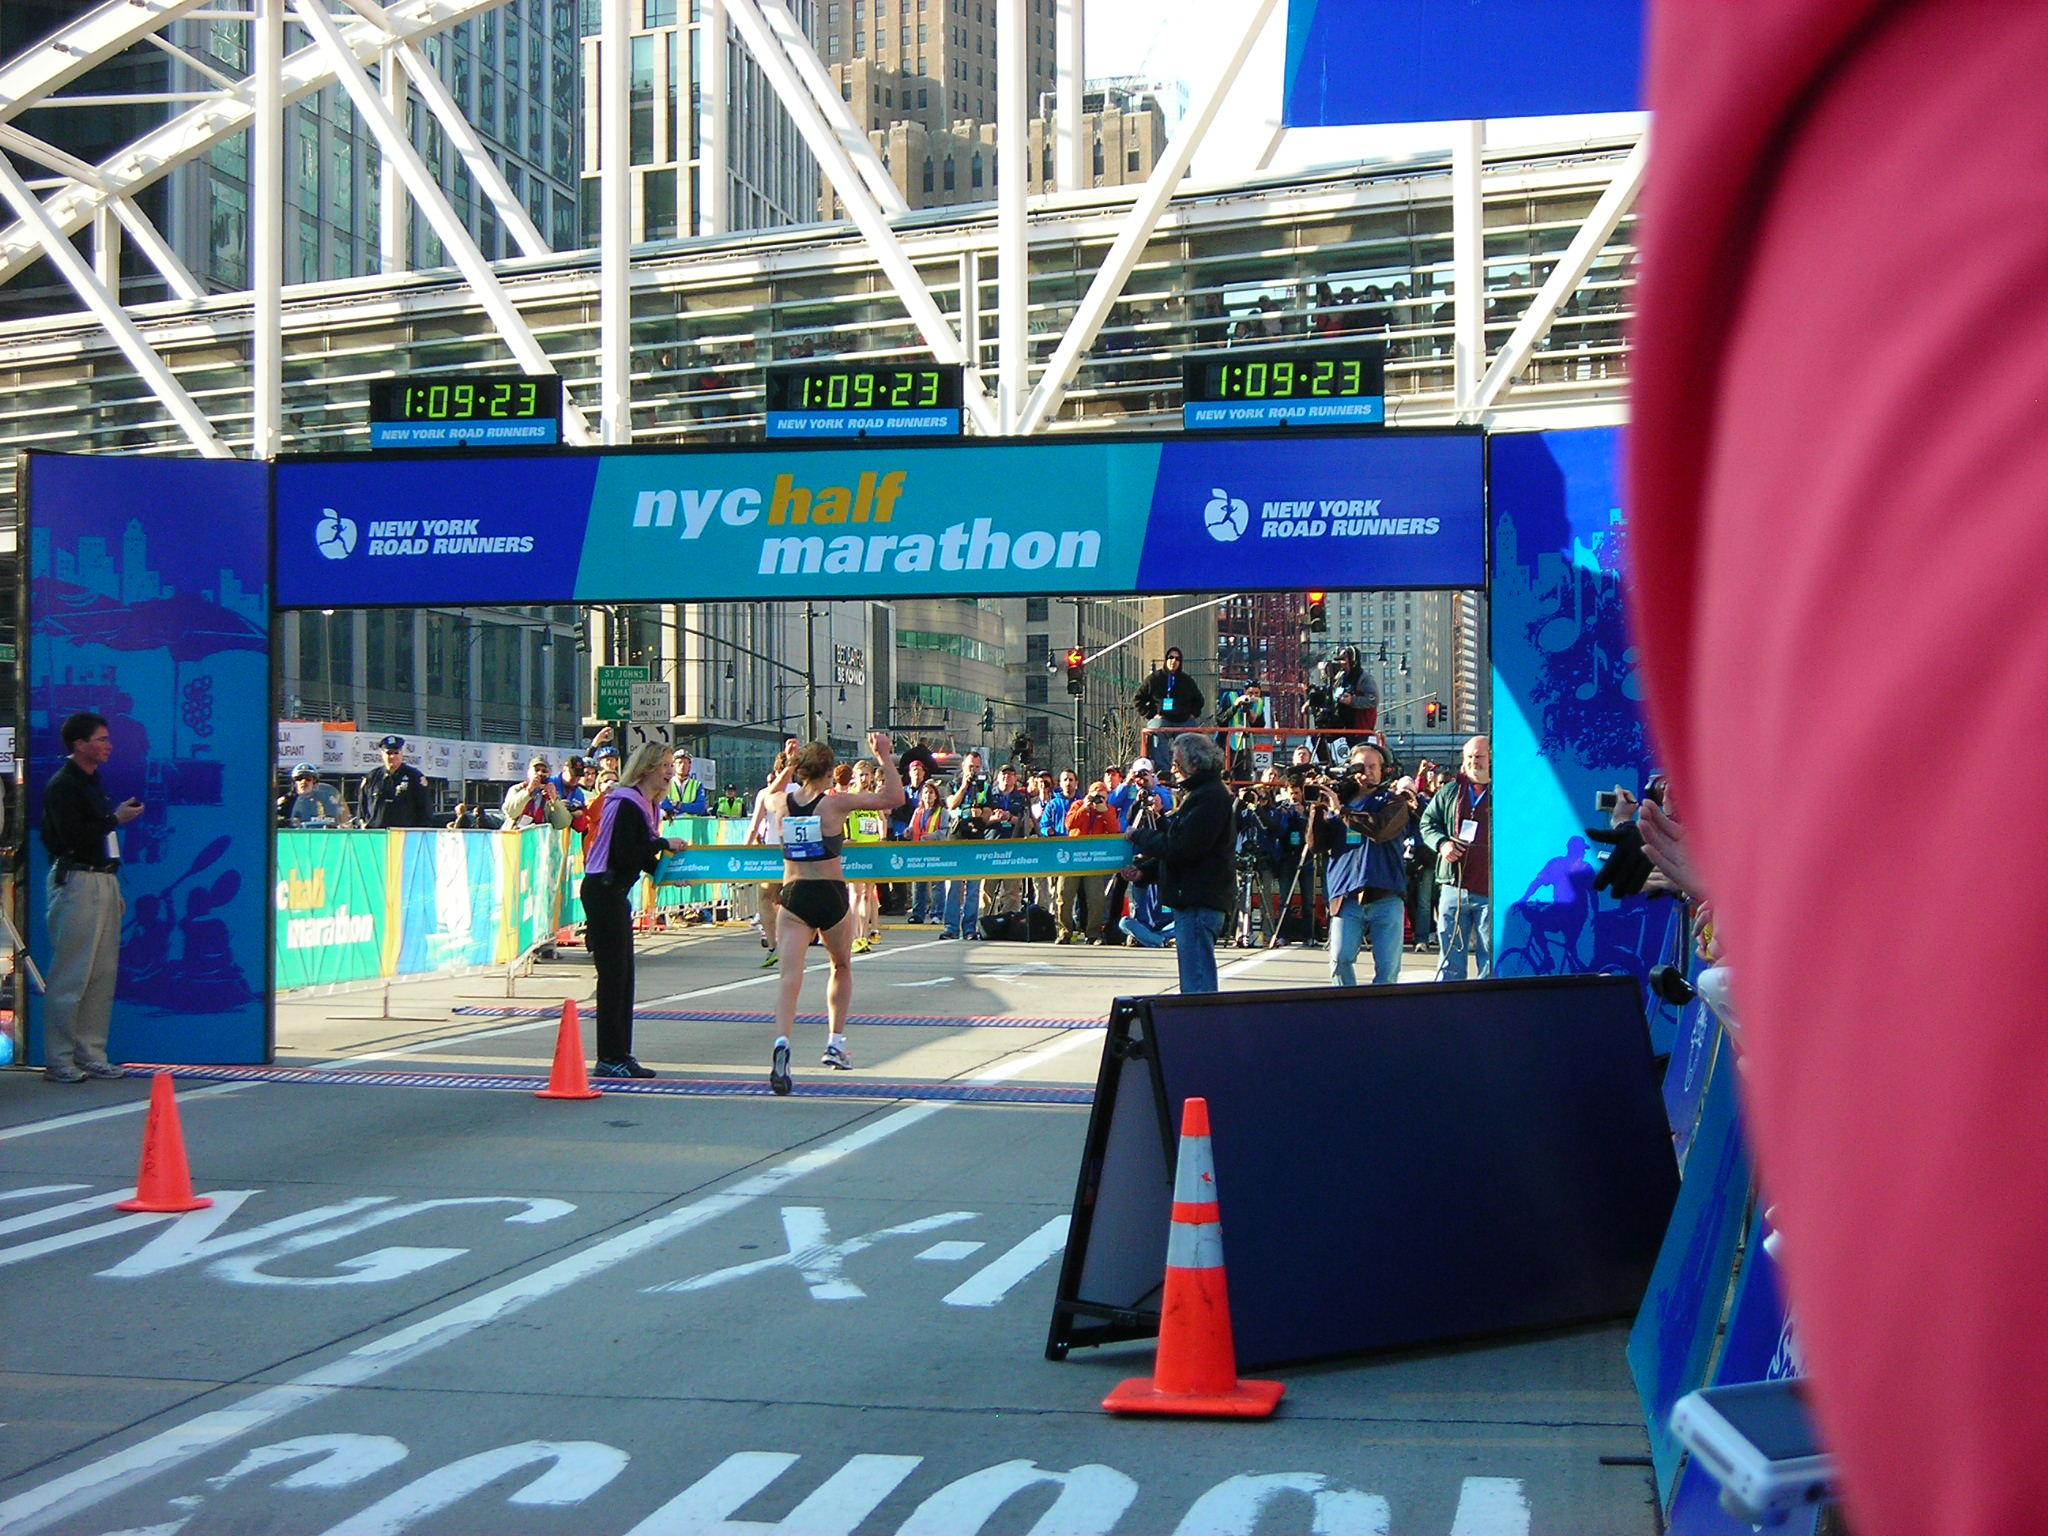 Mara Yamauchi of Great Britain took the women's win in approx 1:09:25.